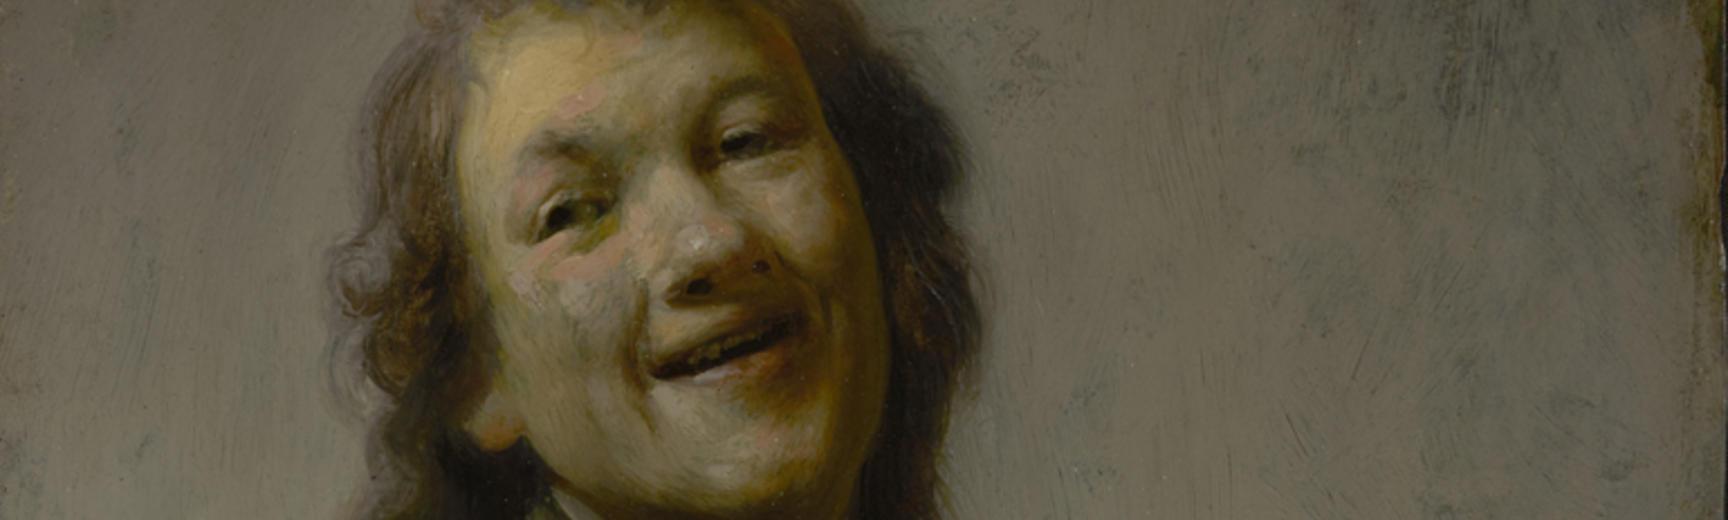 2020 Young Rembrandt Exhibition – Rembrandt, Rembrandt Laughing, c. 1628 © J Paul Getty Museum, Los Angeles